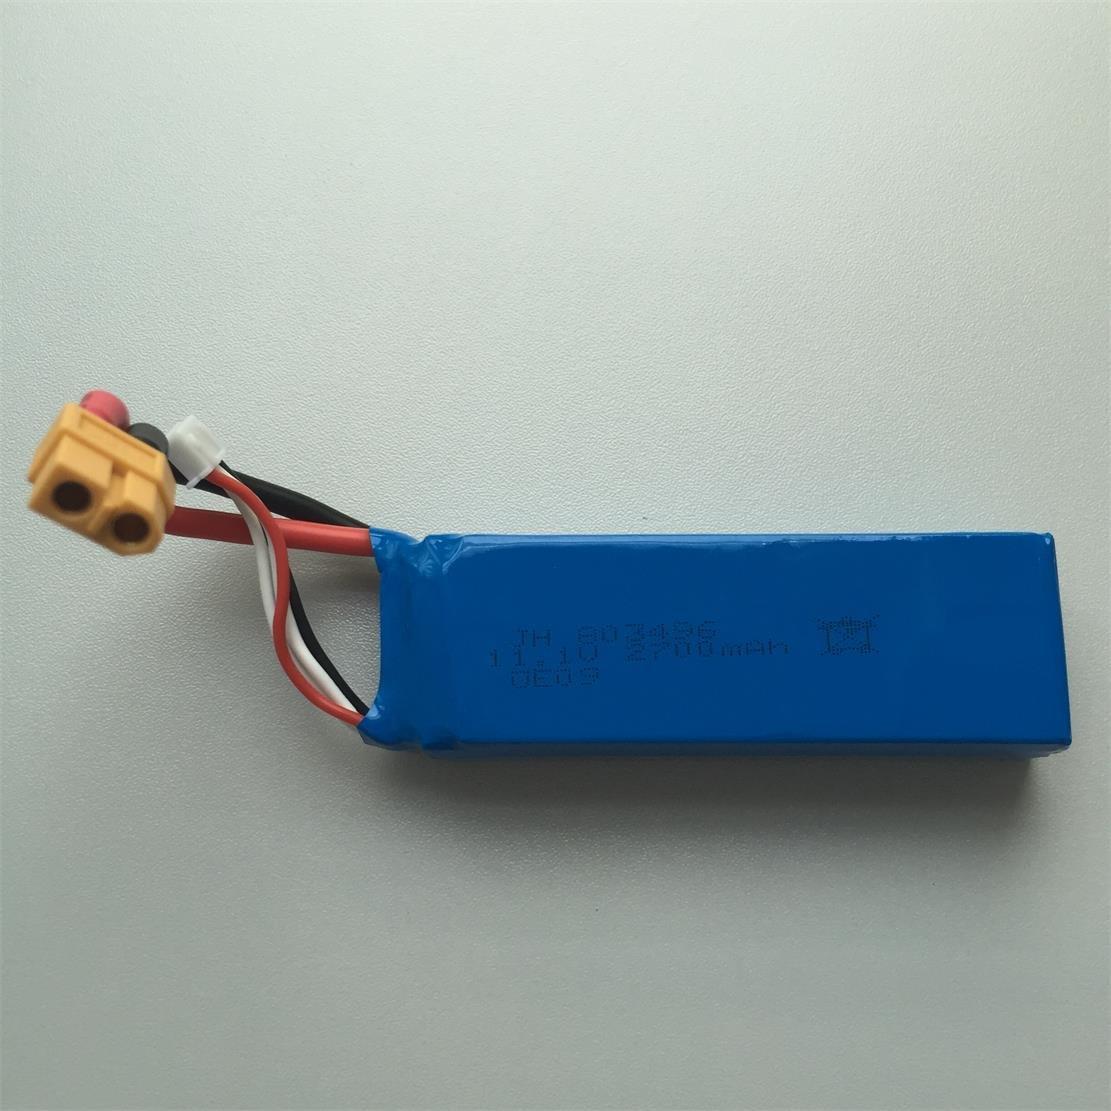 UUmart 30C 11.1V 2700mAh Lipo Battery For Cheerson CX-20 Wltoys...